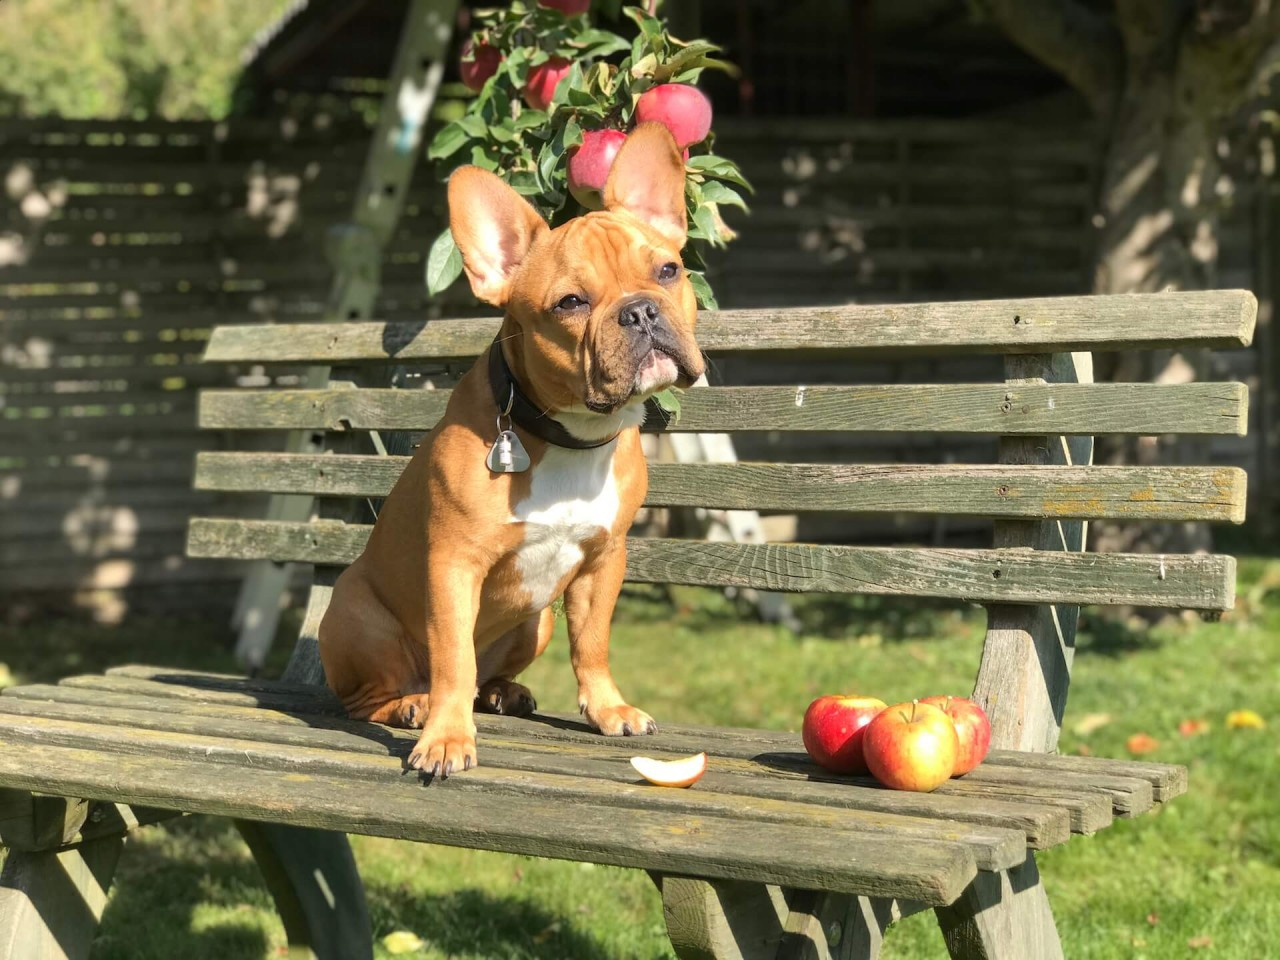 TeneFritz_Apfel_Obst_fur_Hunde